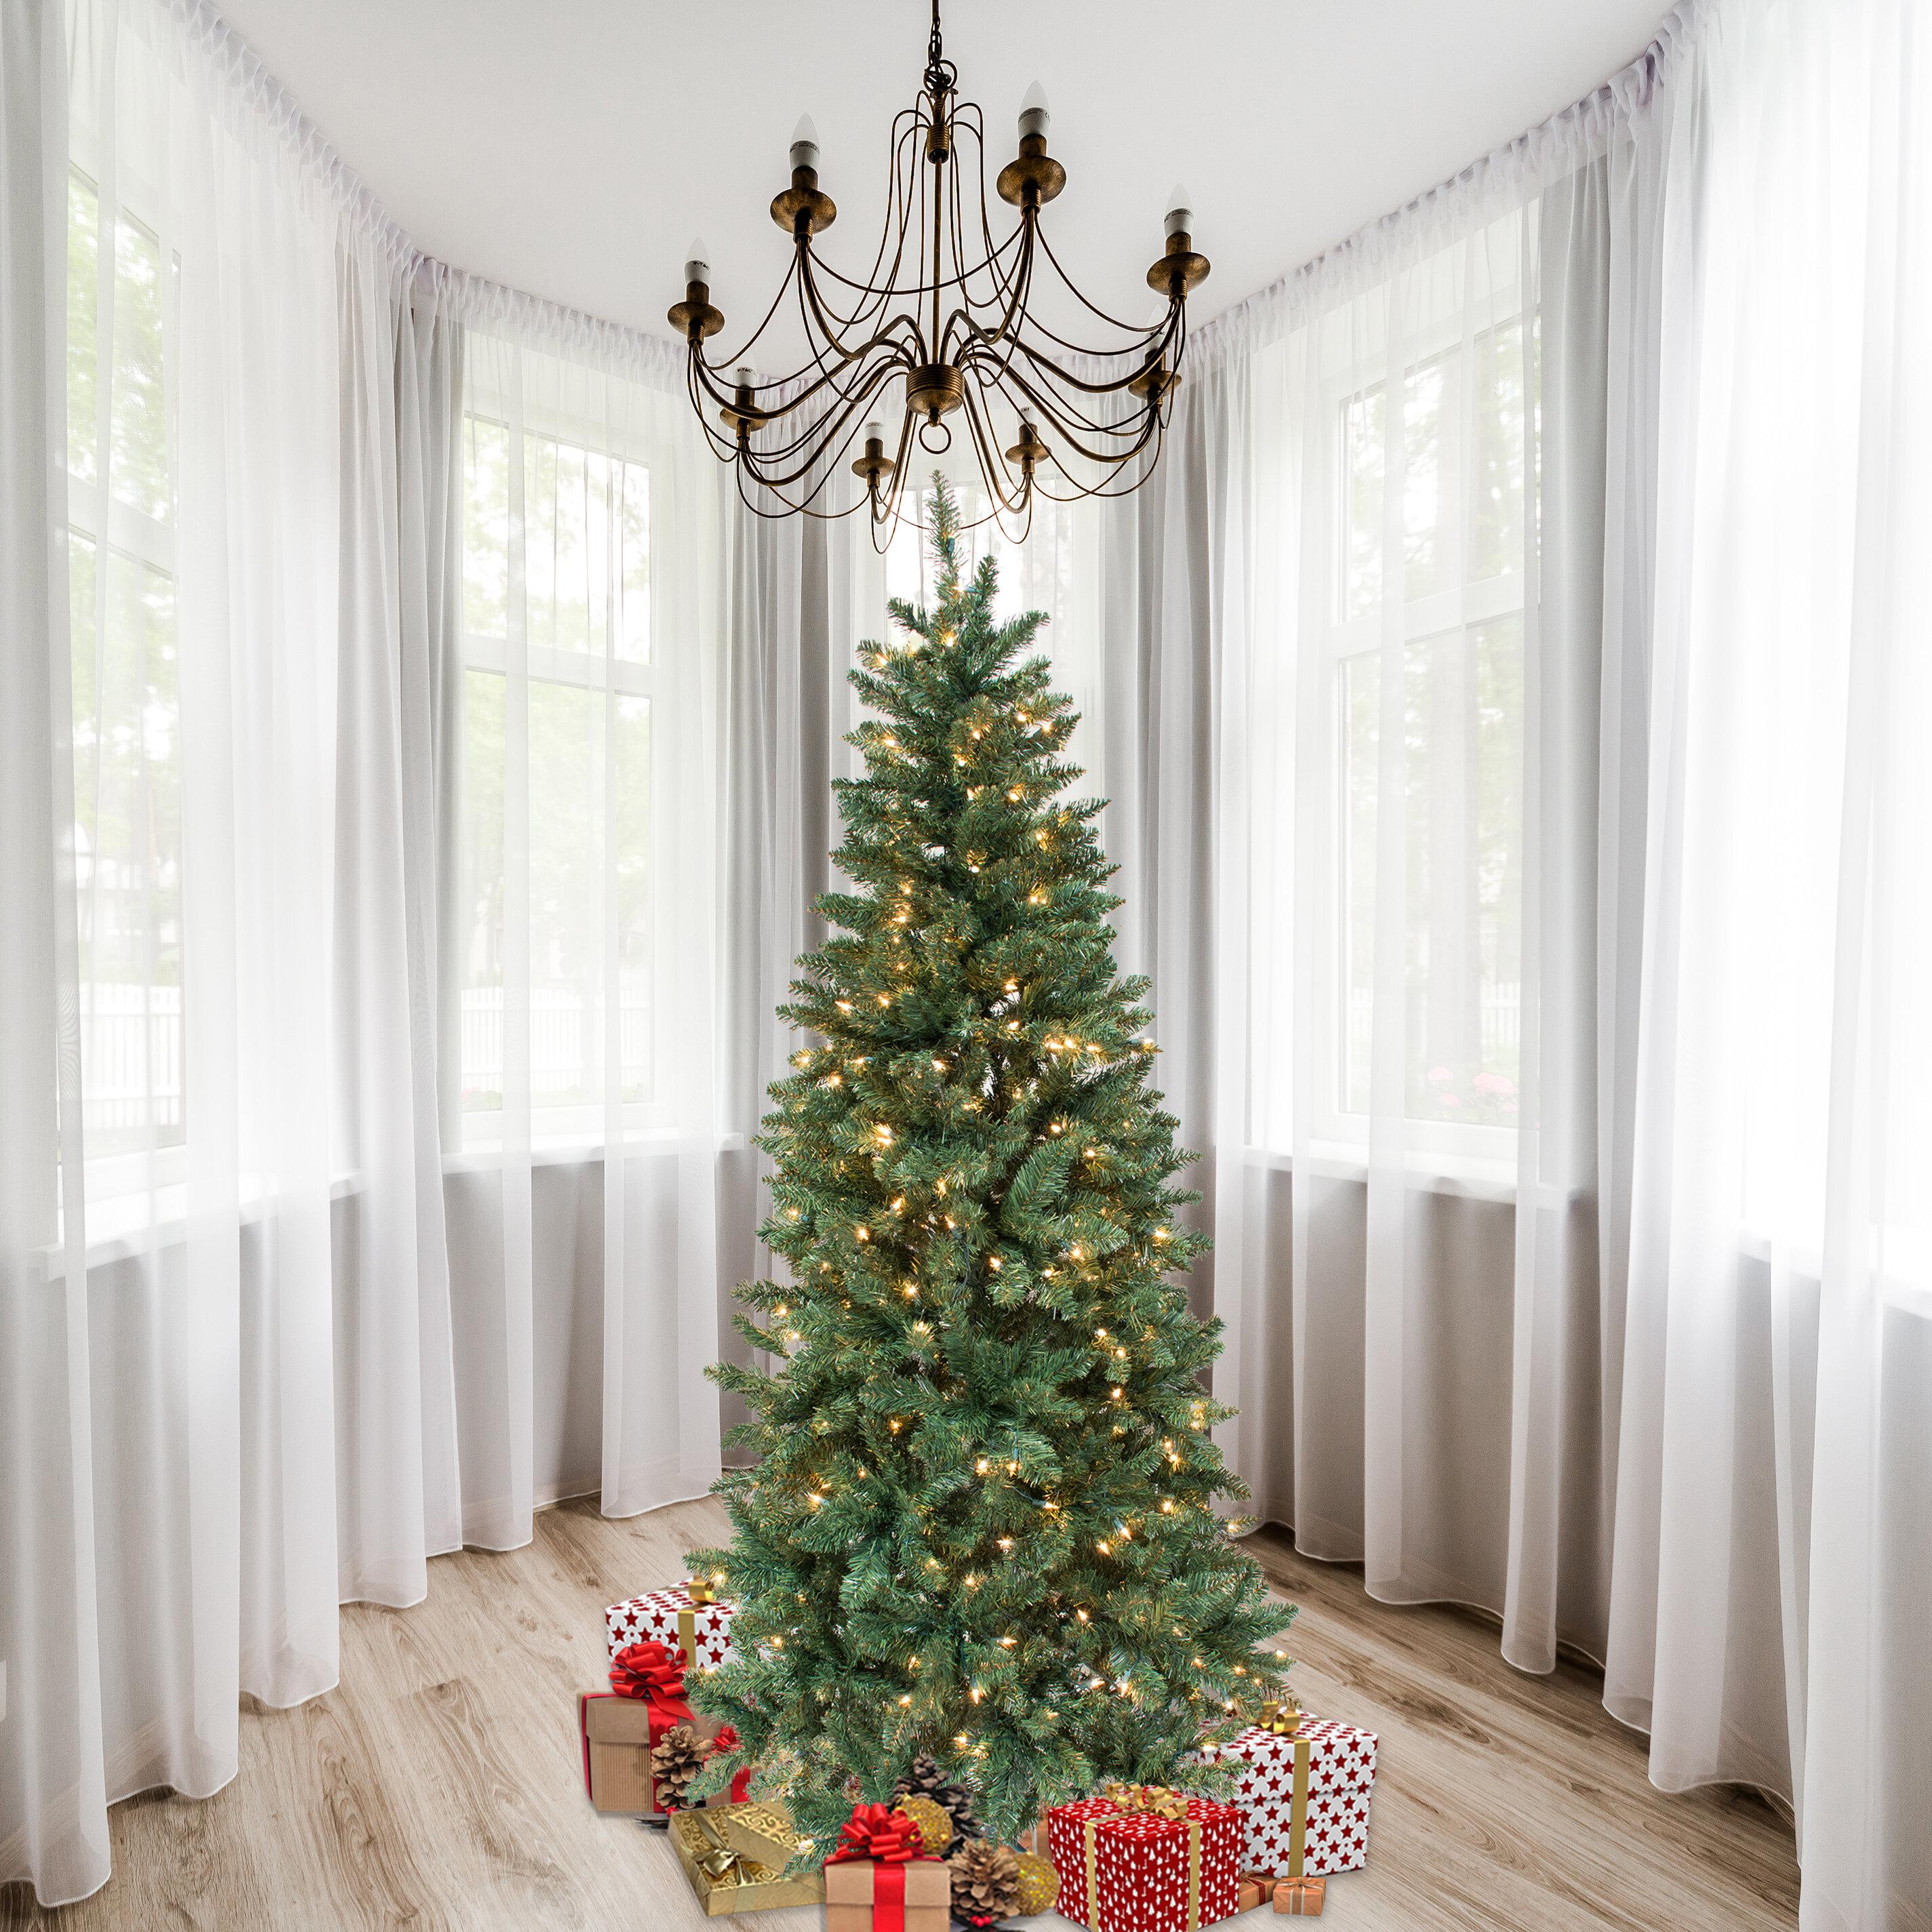 Andover Mills 7' Green Douglas Fir Artificial Christmas Tree with 300 Clear Lights & Reviews | Wayfair